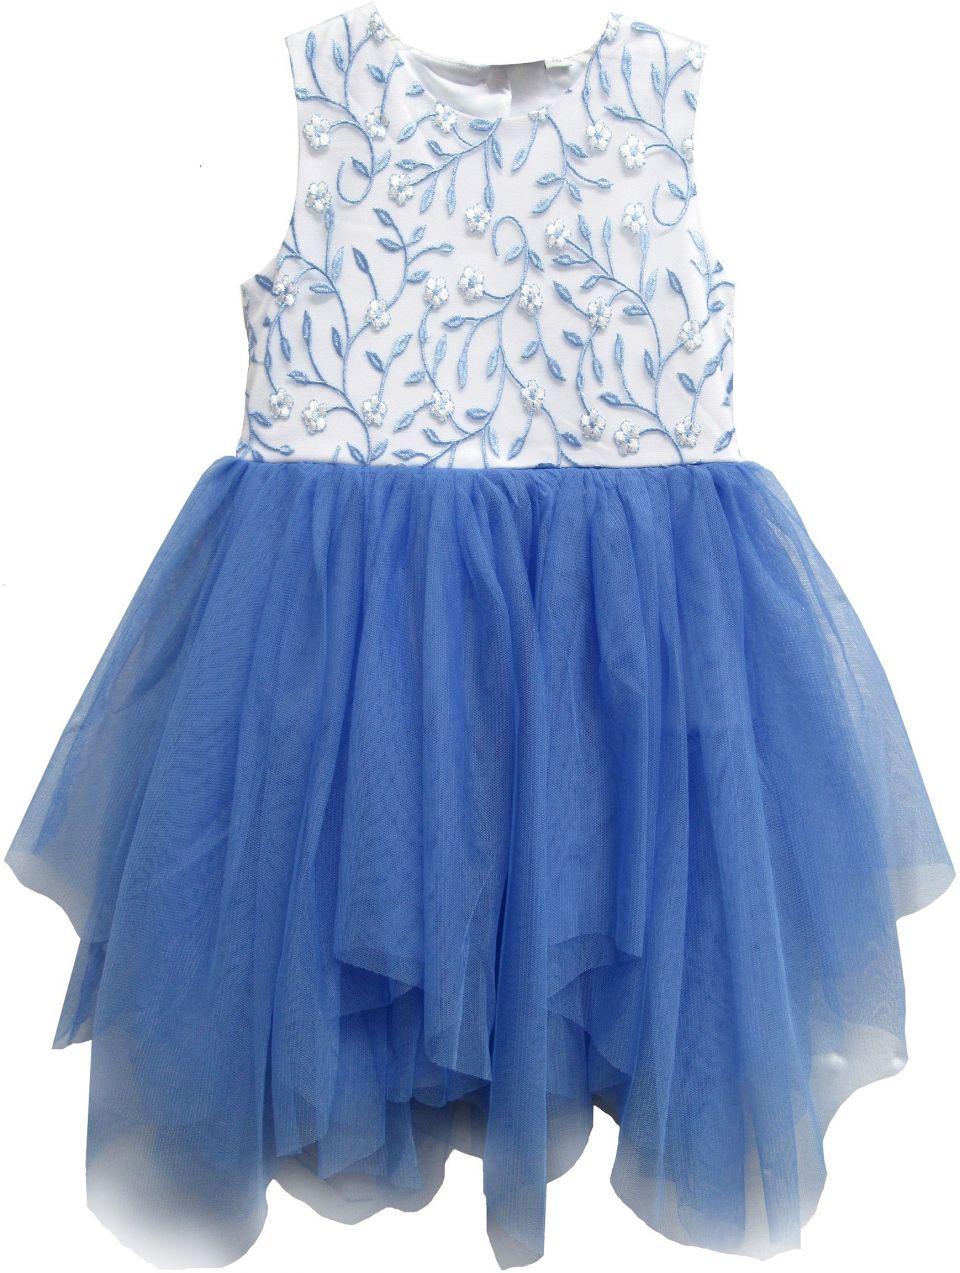 Topo Dievčenské šaty - bielo-modré značky Topo - Lovely.sk 0b0cd3a7a5b